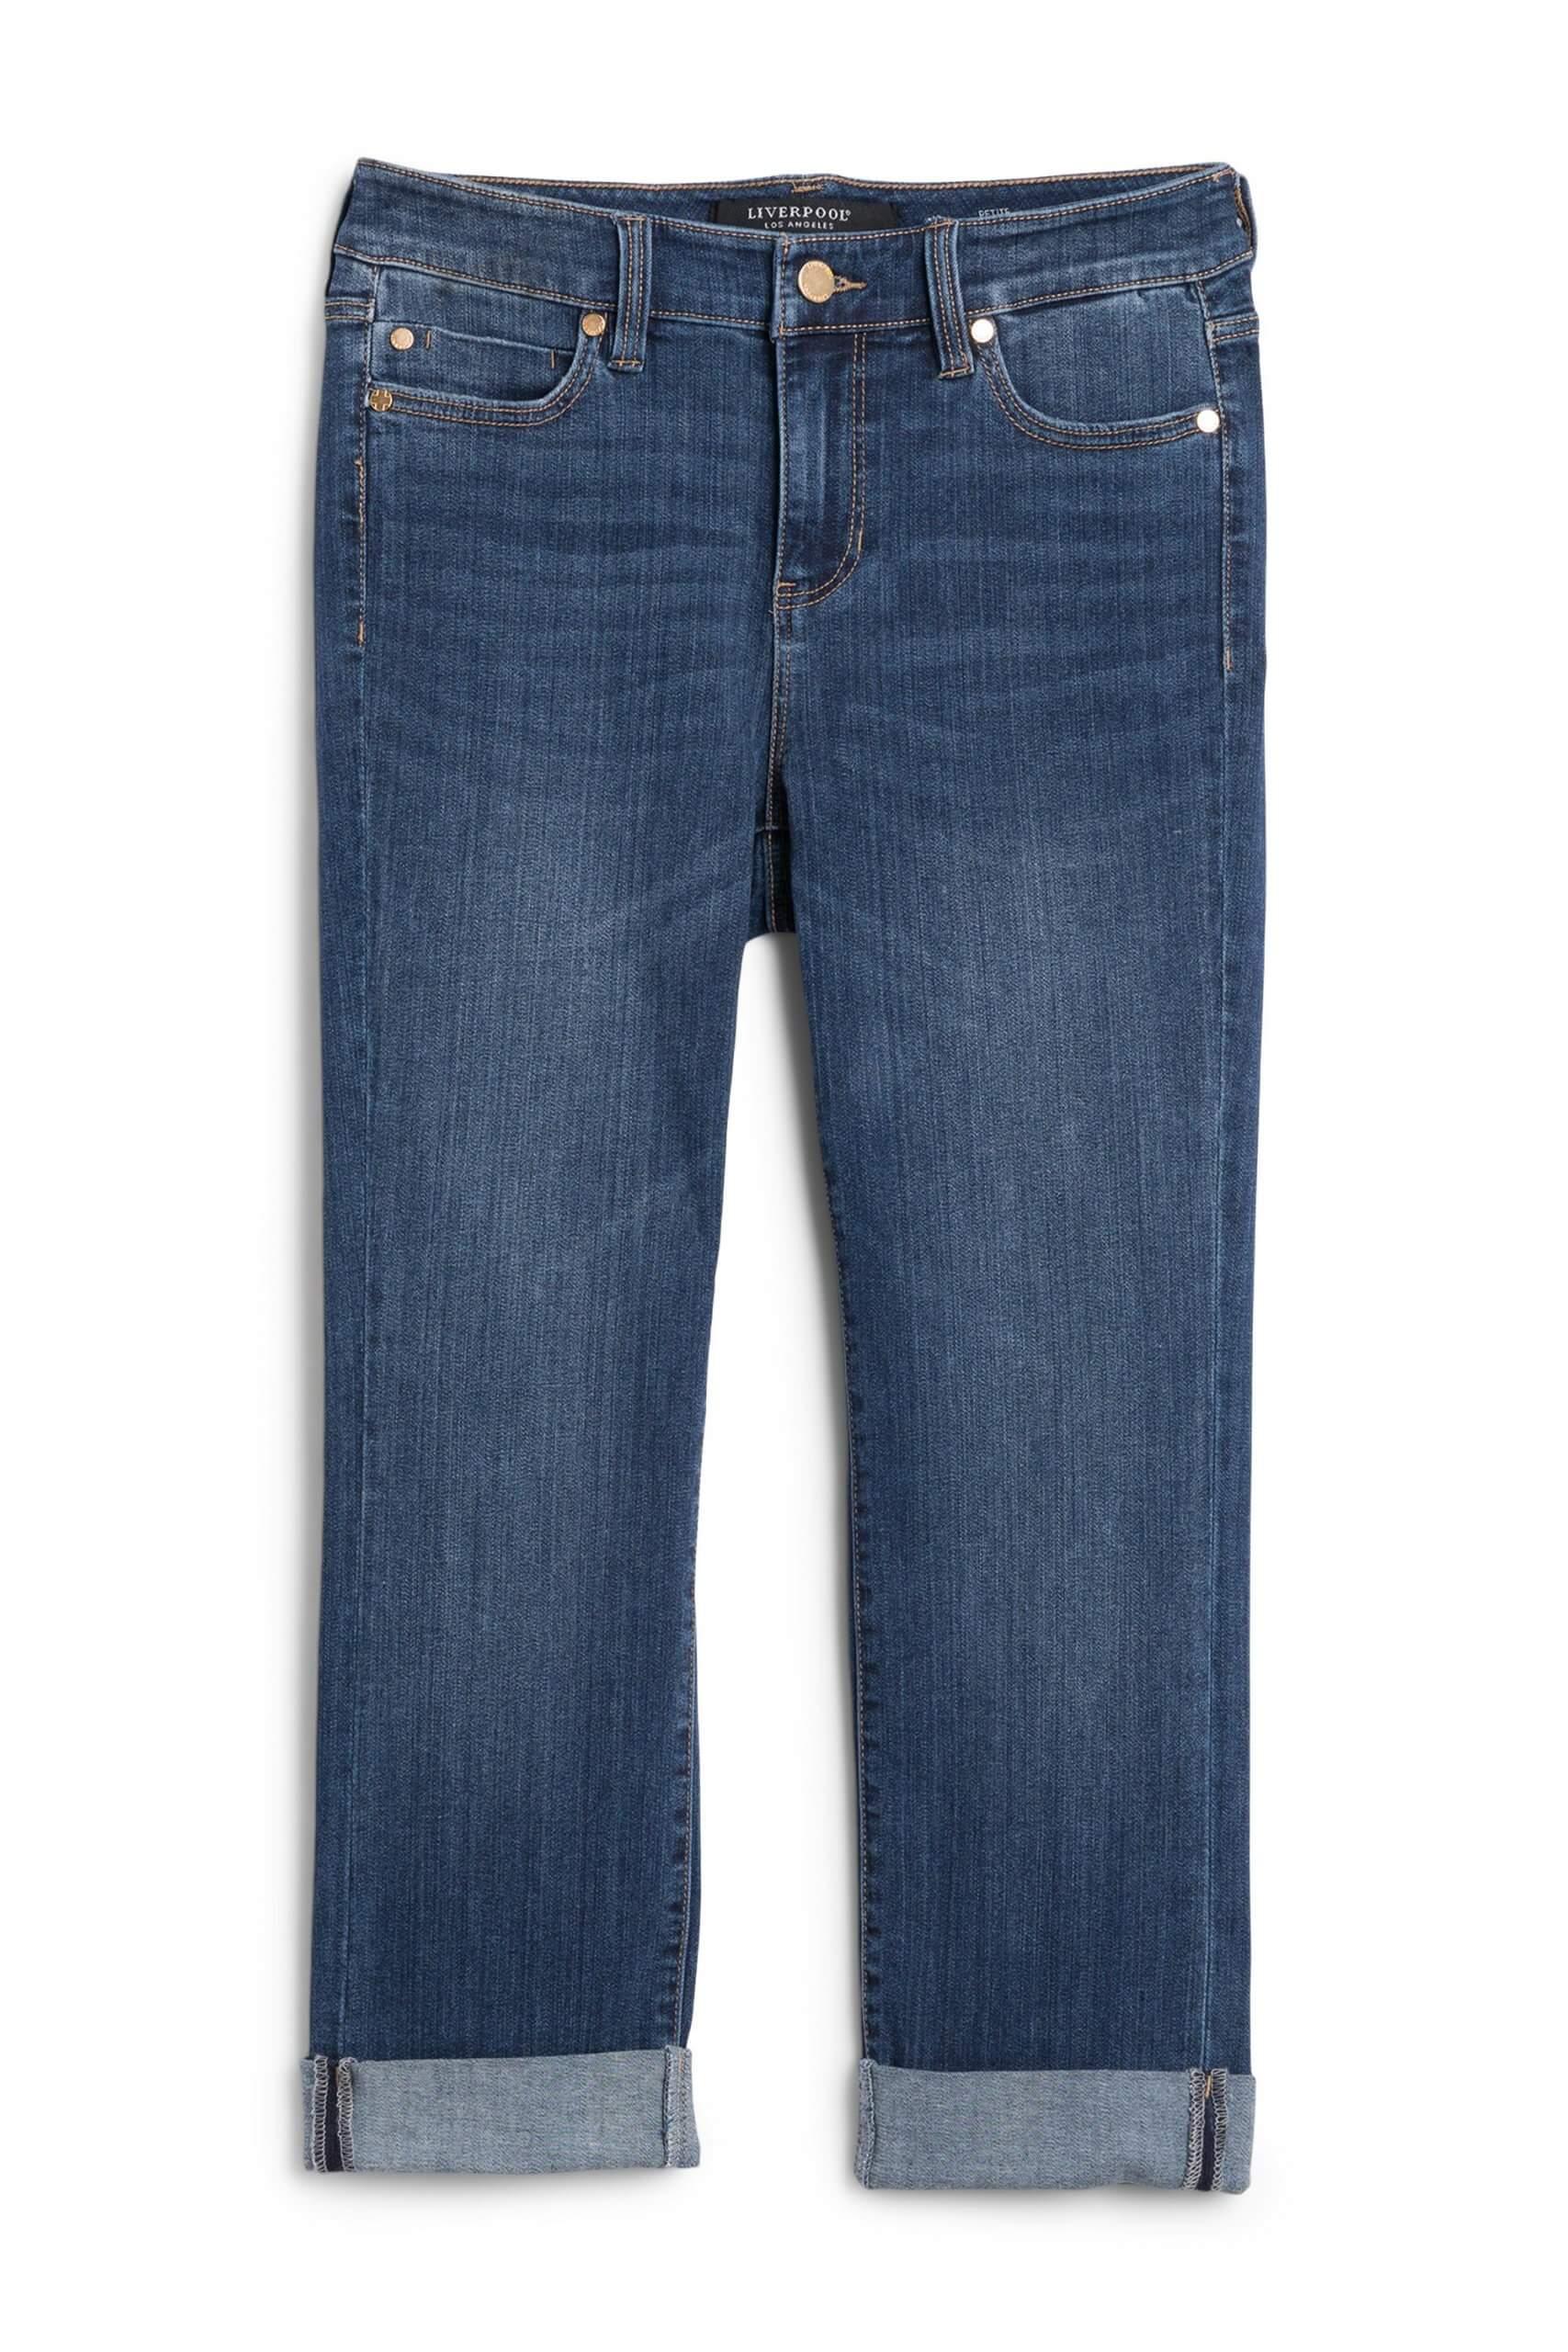 Stitch Fix Women's dark wash cuffed jeans.